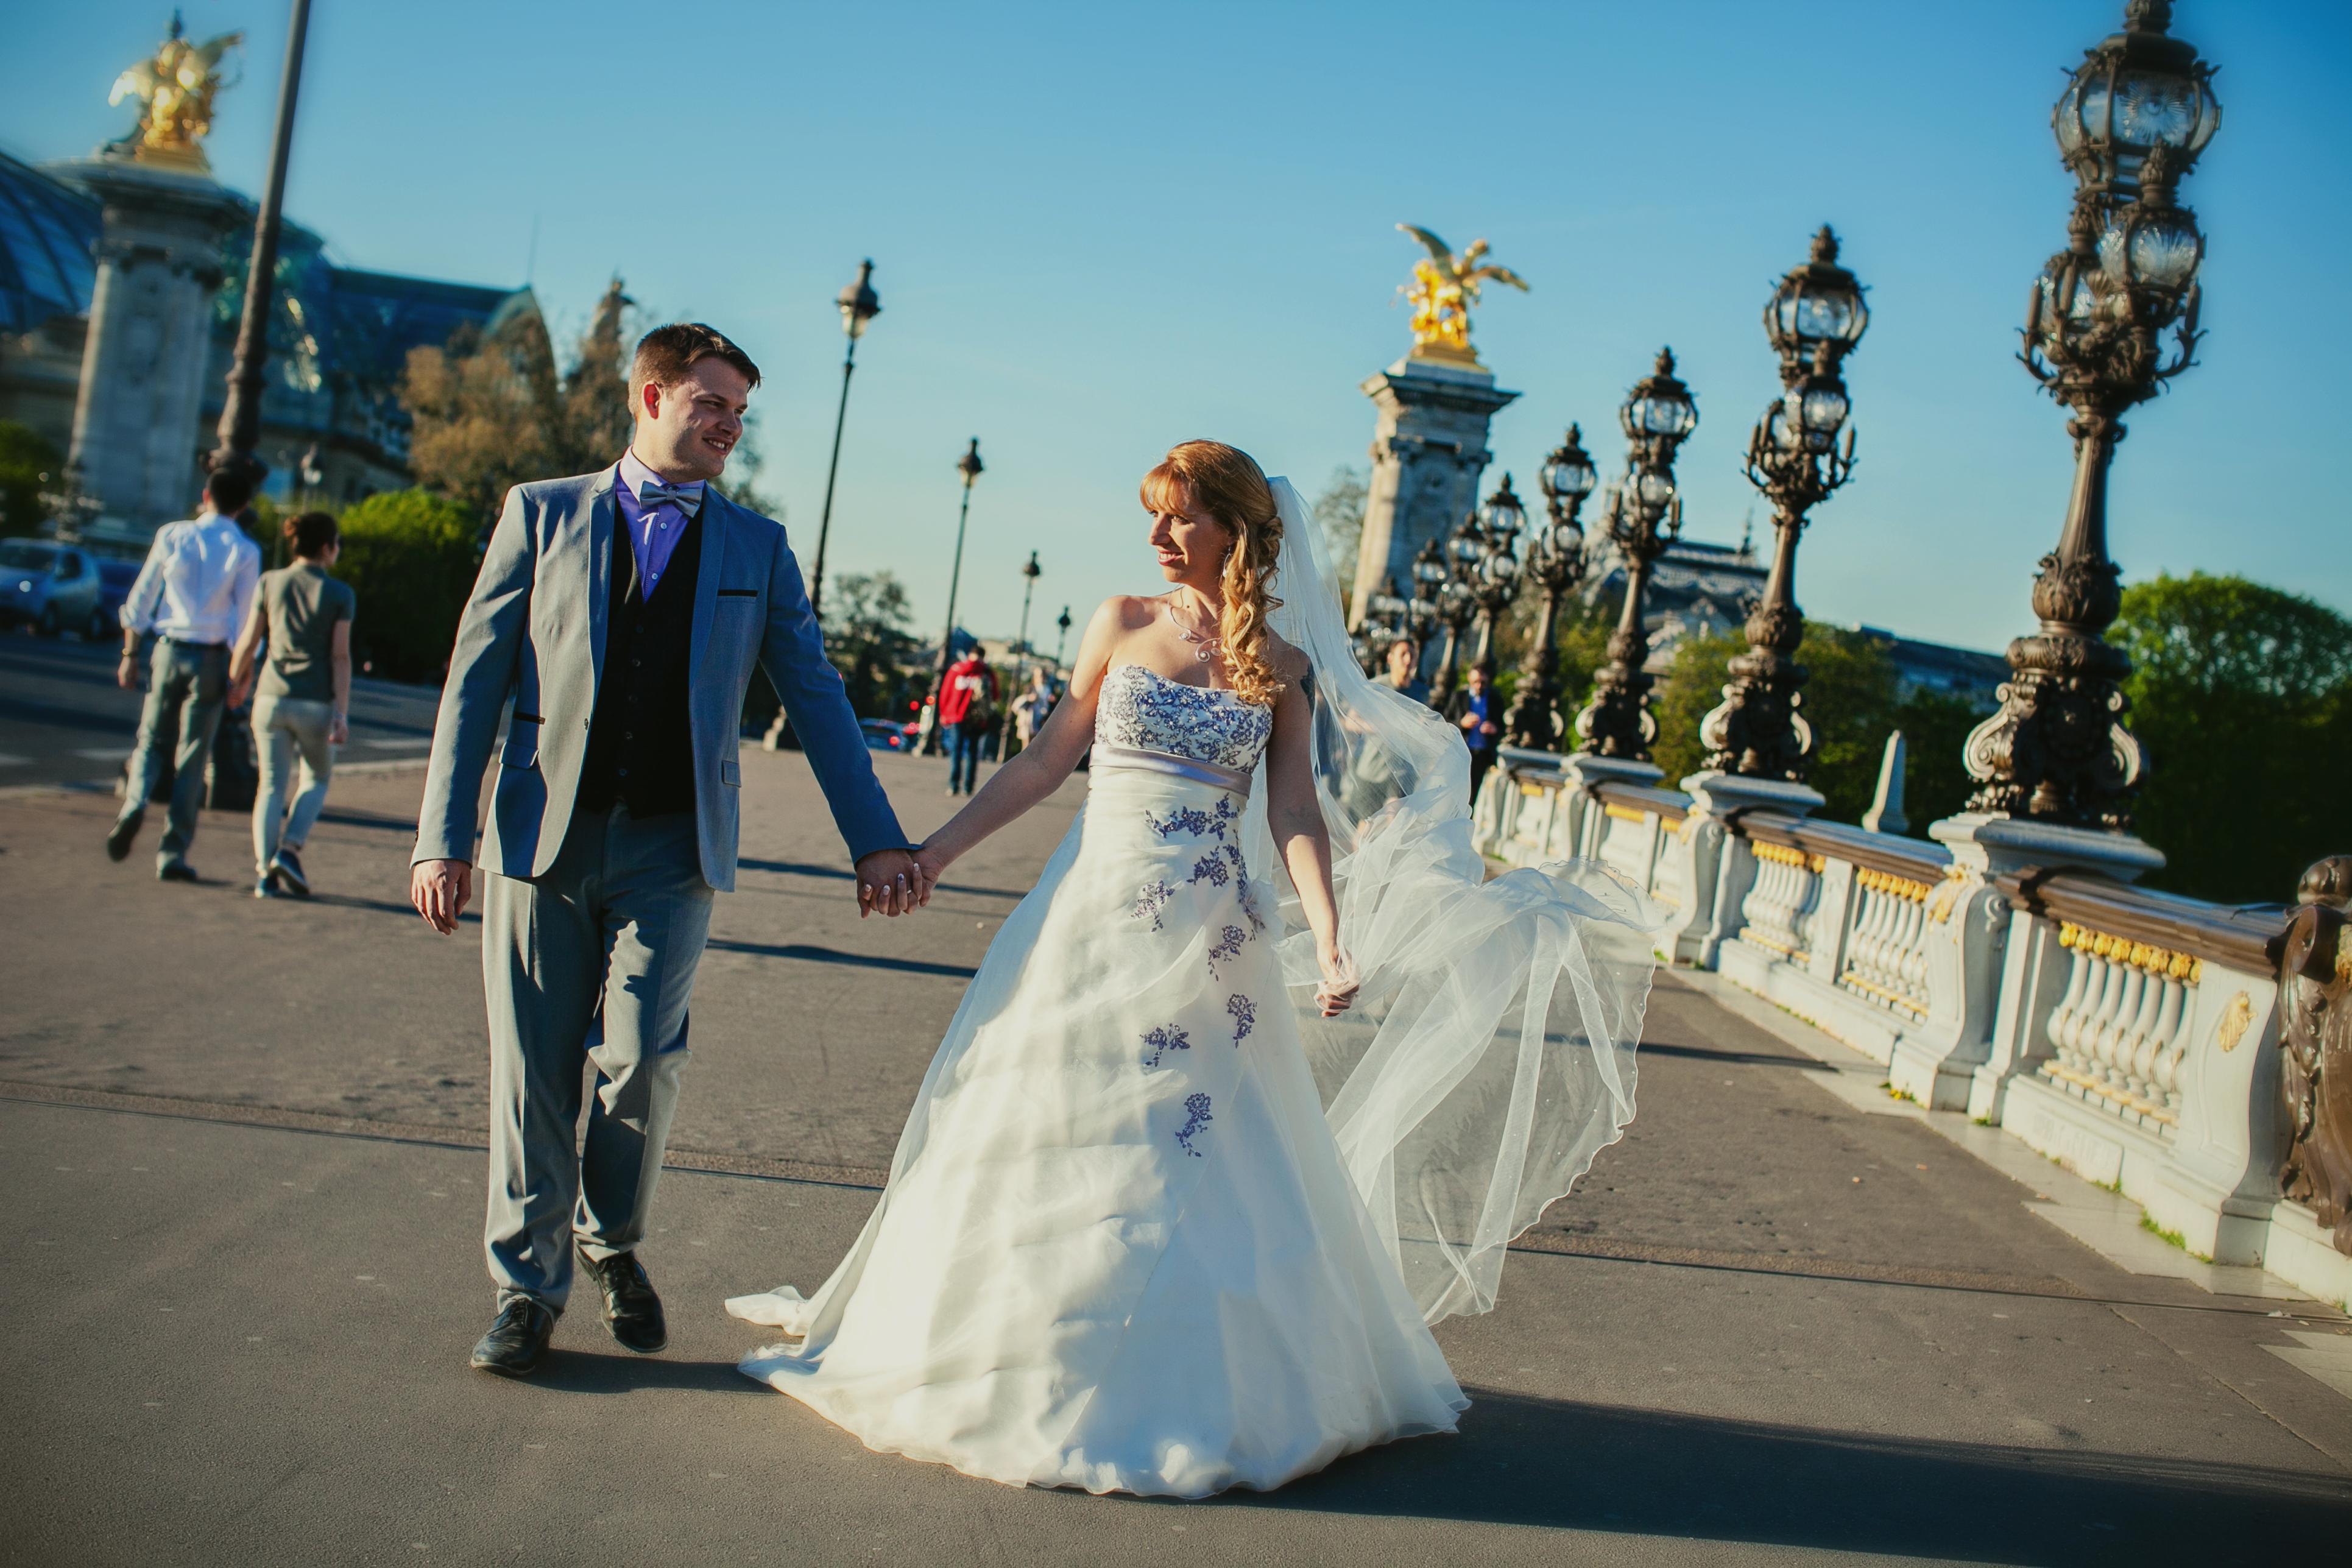 Mon mariage franco-américain en lilas et blanc : le bilan